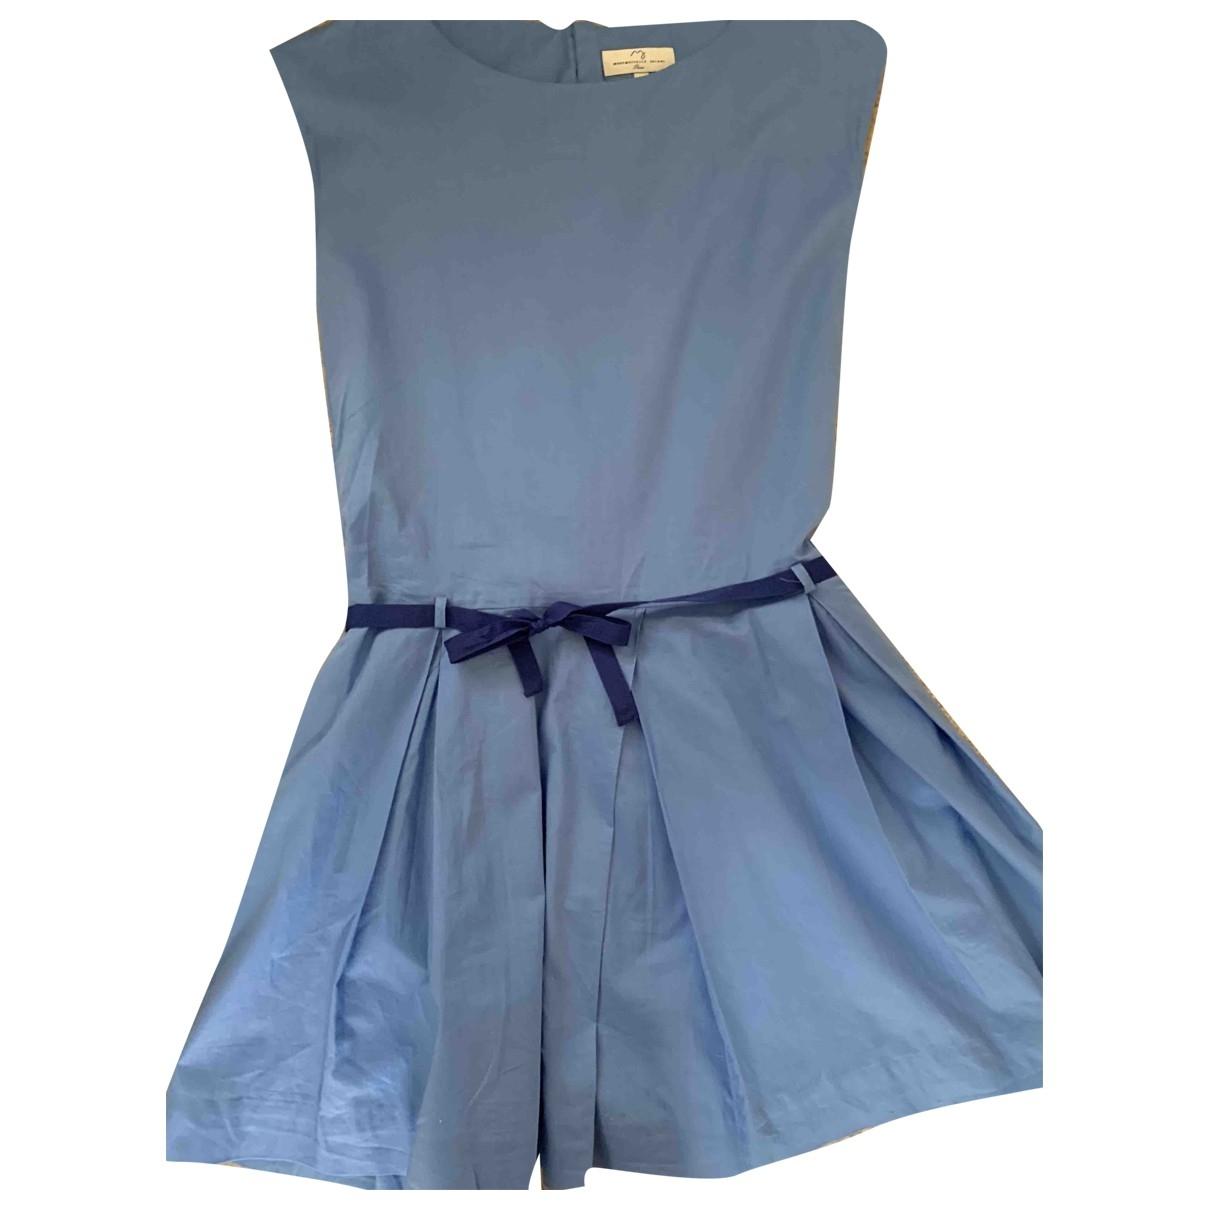 Jacadi \N Blue Cotton dress for Kids 16 years - M FR